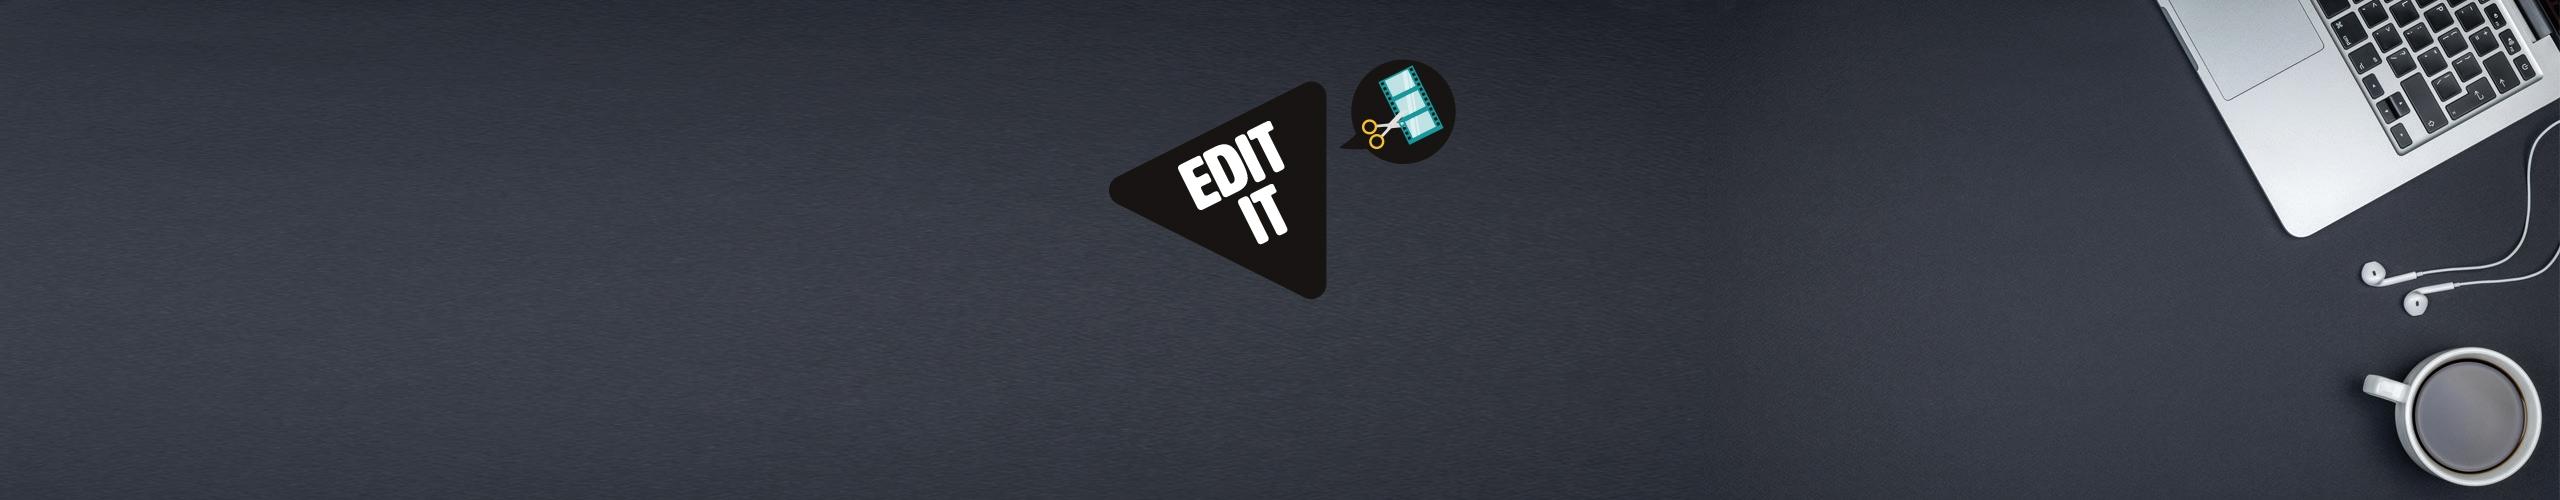 Video's & editing